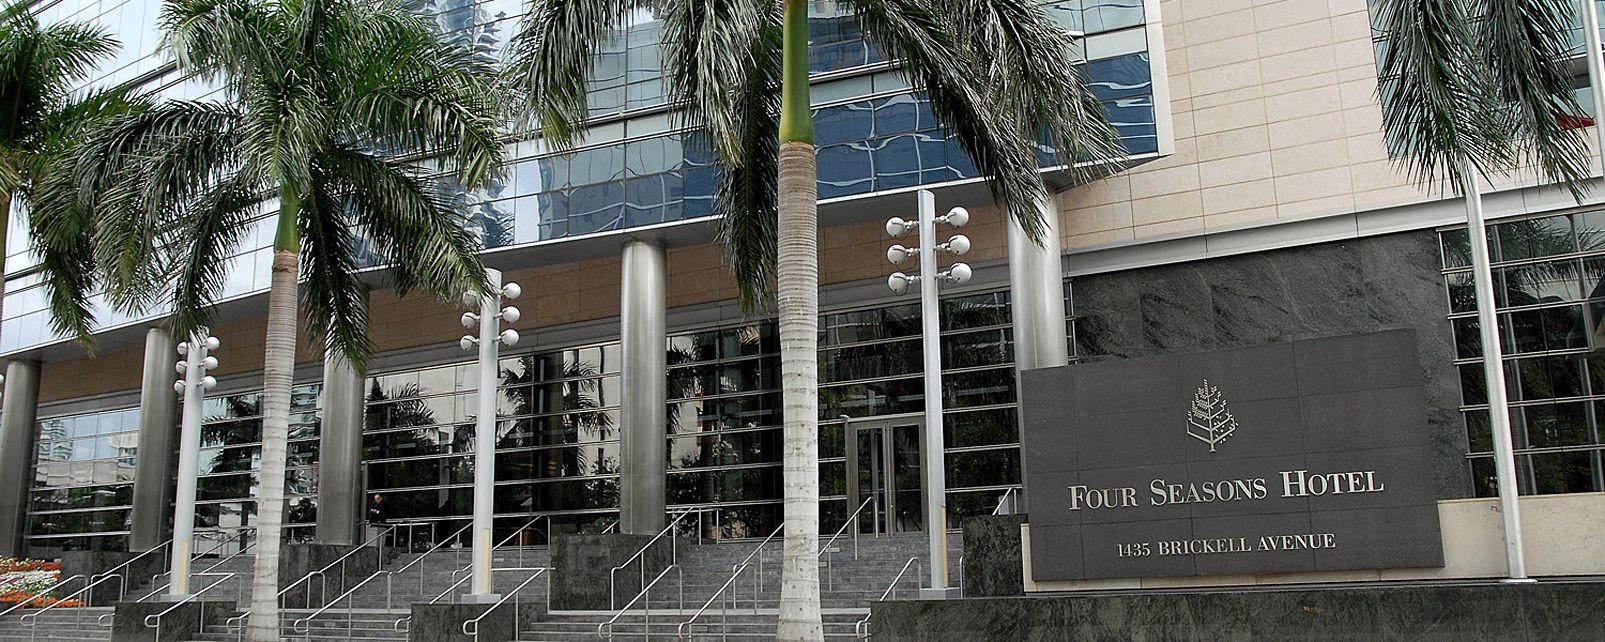 Hôtel Four Seasons Miami